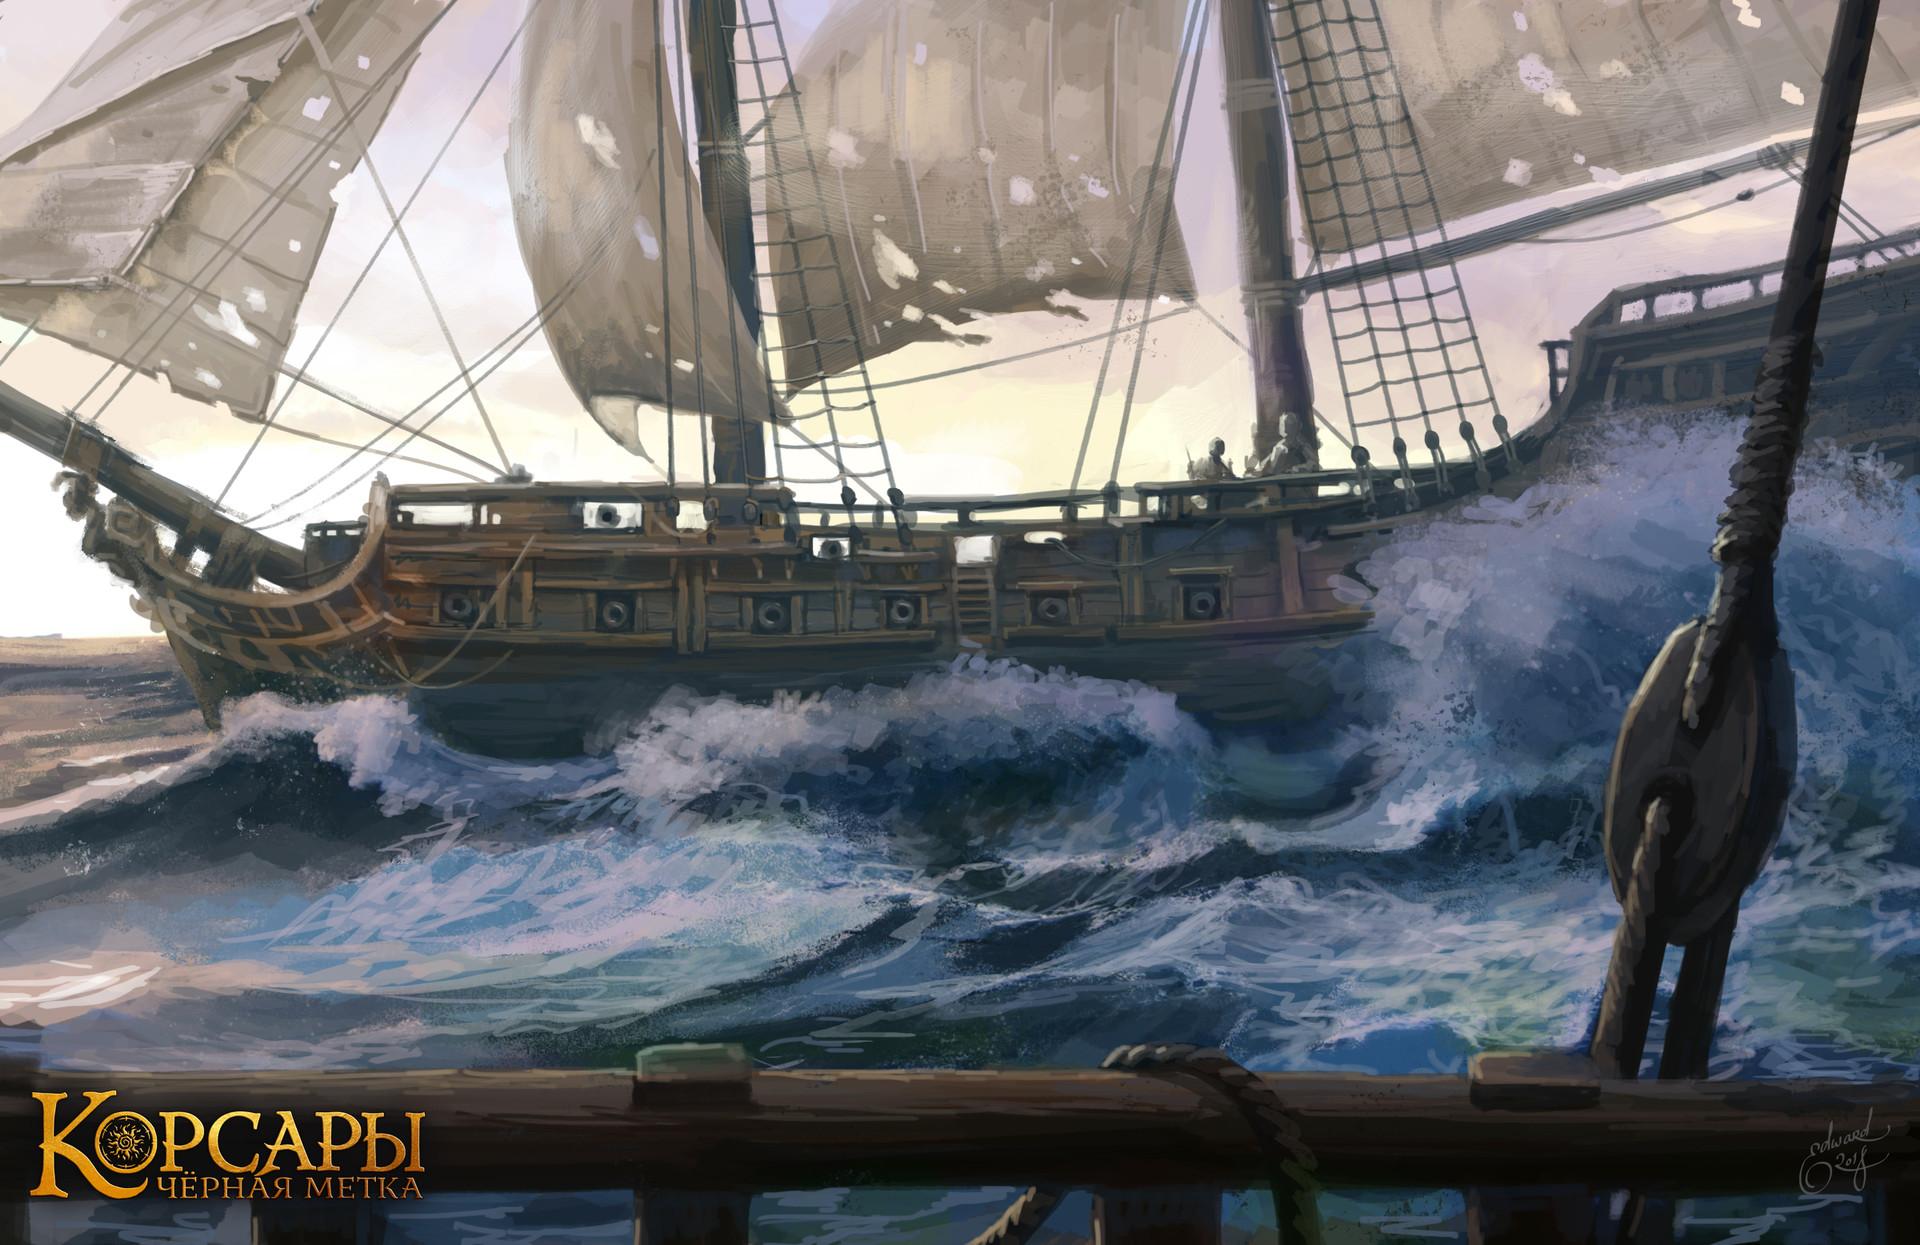 (illustration for Black Sun Game Publishing)